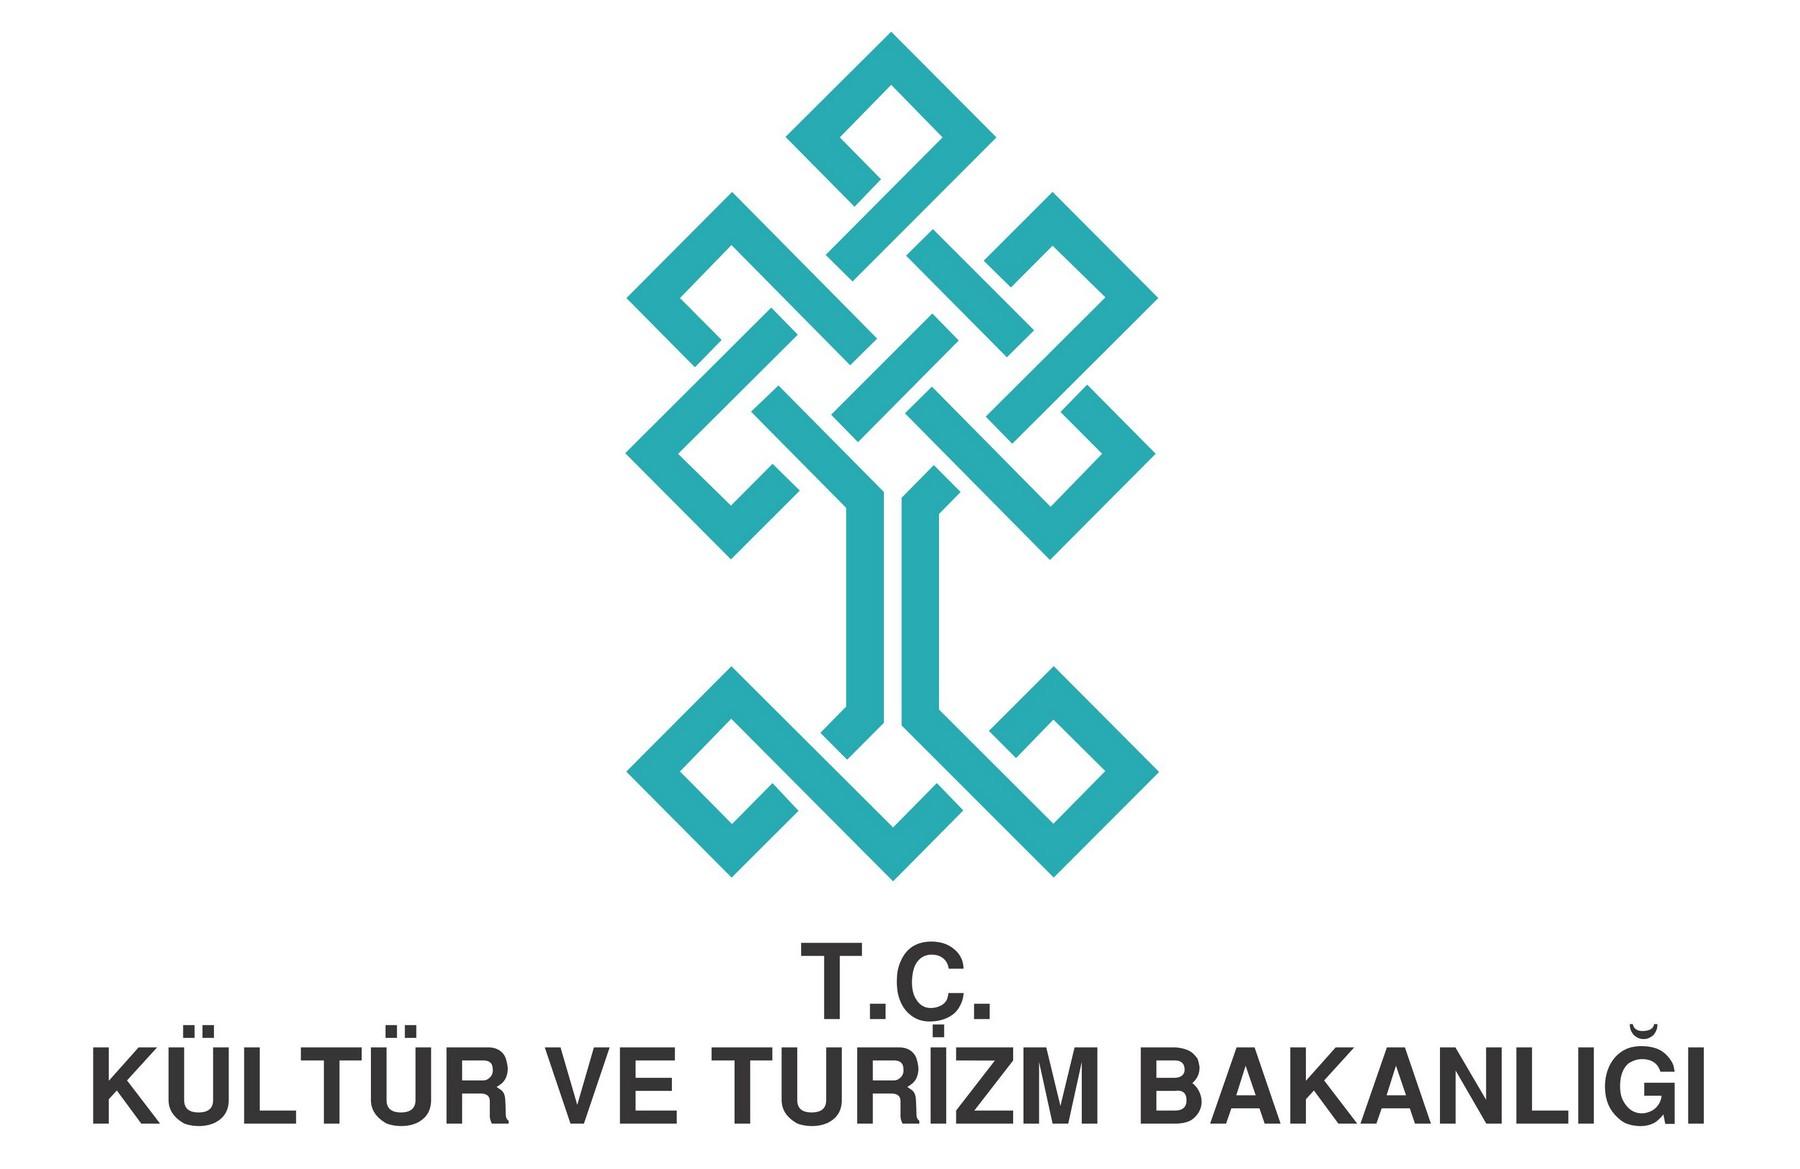 tc-kultur-ve-turizm-bakanligi-logo.jpg